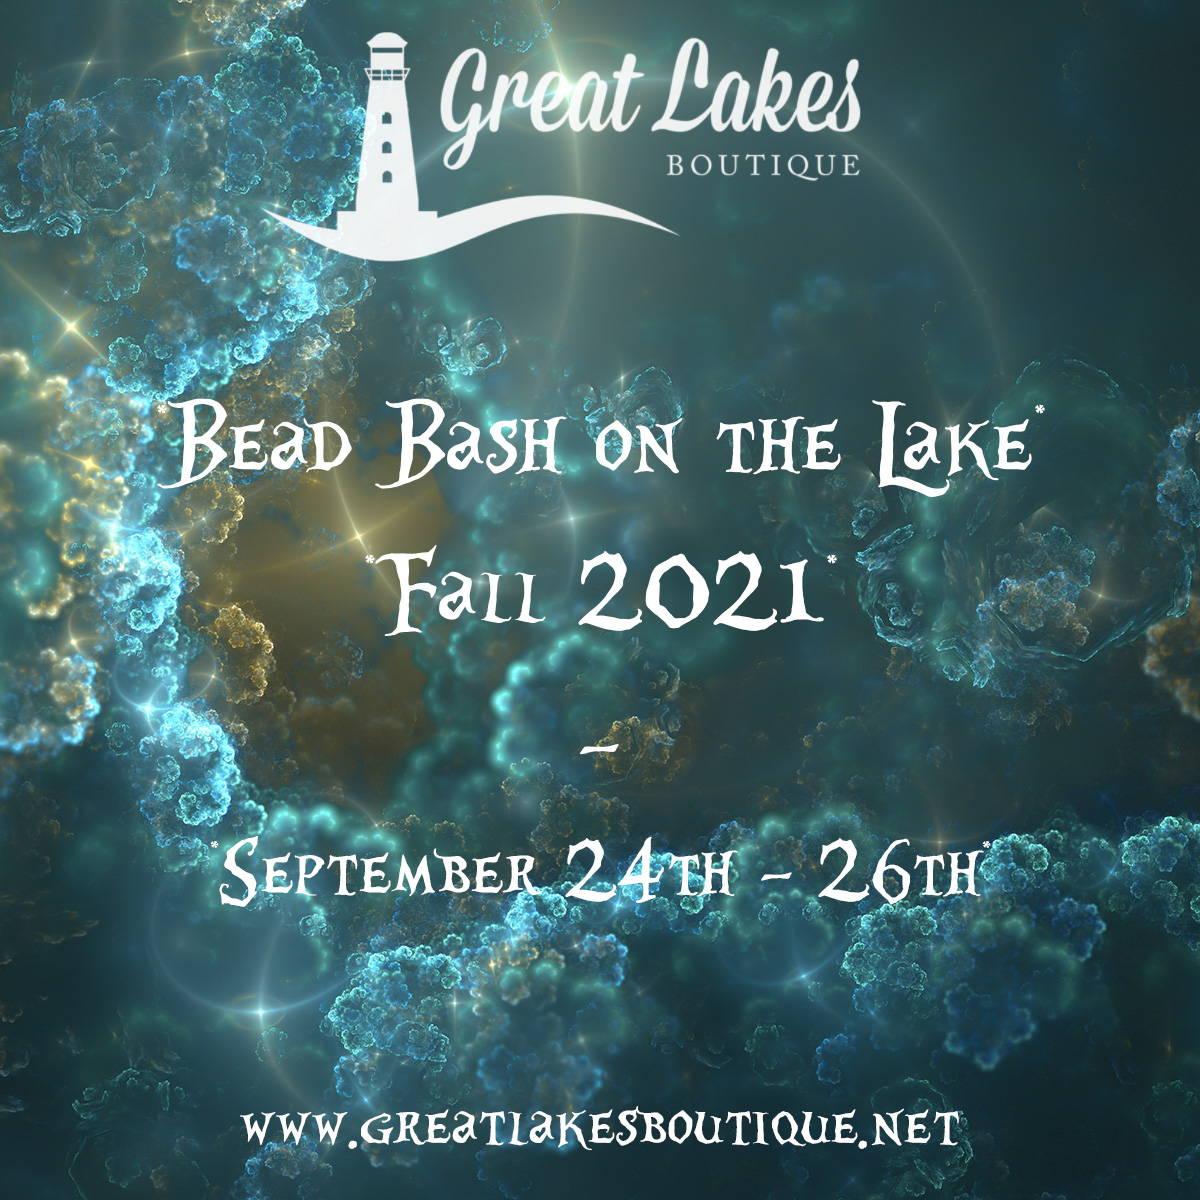 Bead Bash on the Lake Fall 2021